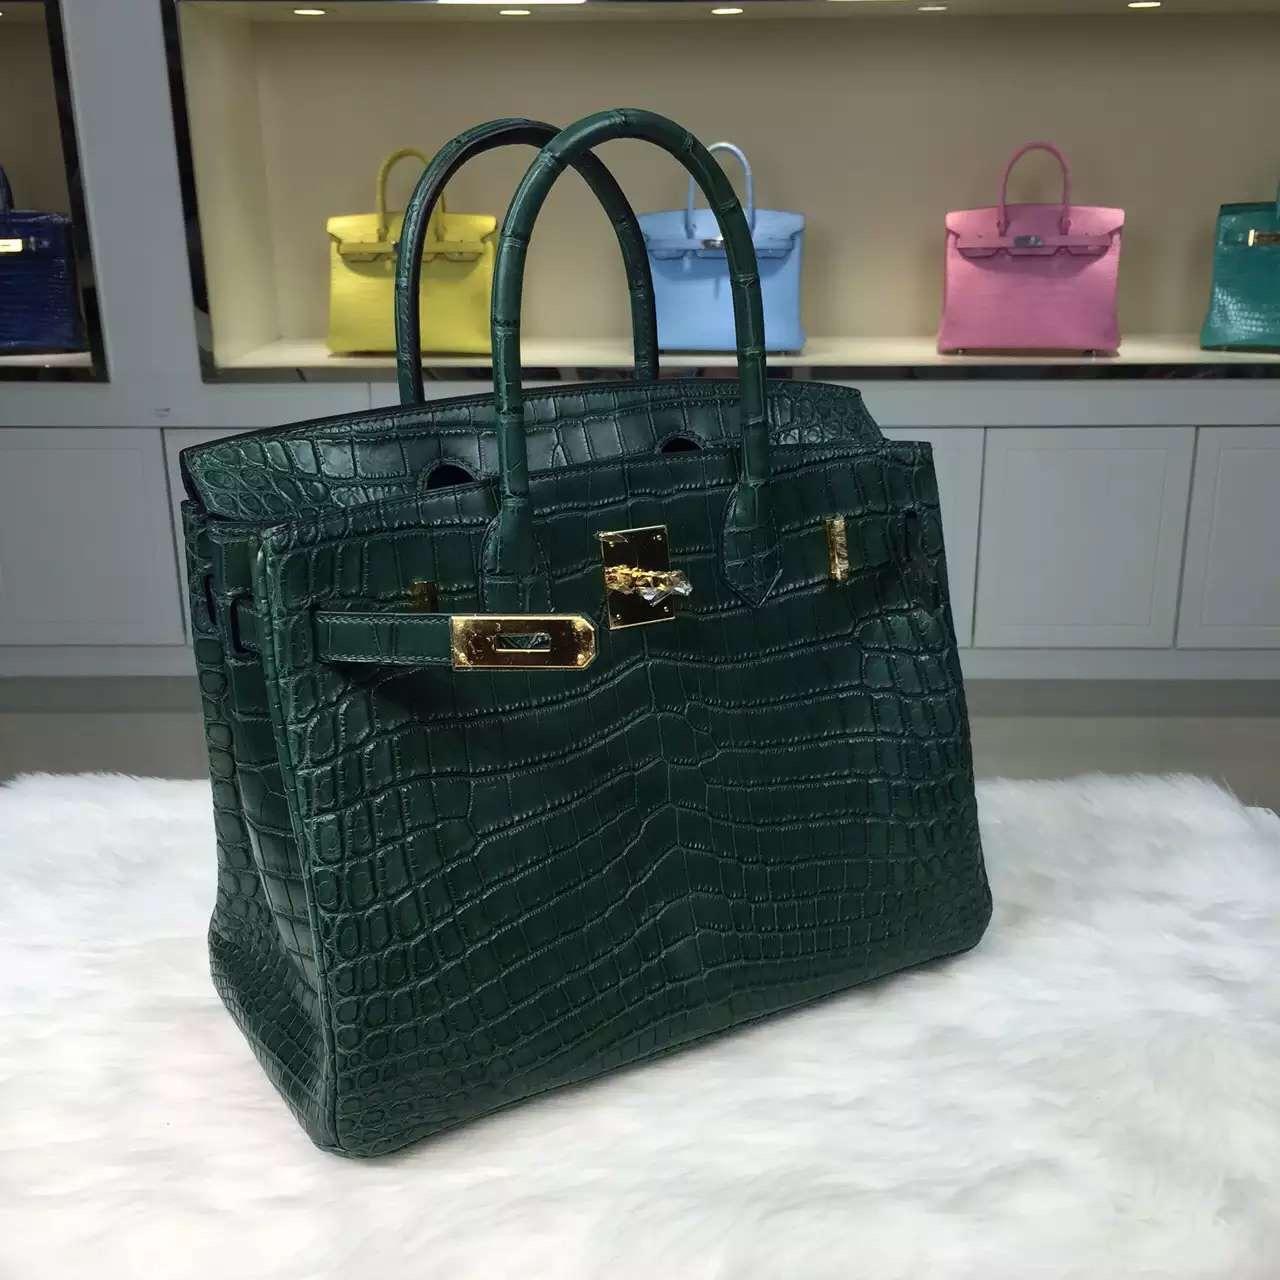 Wholesale Hermes Birkin Bag30cm 1T Cactus Green Crocodile Leather Women's Tote Bag